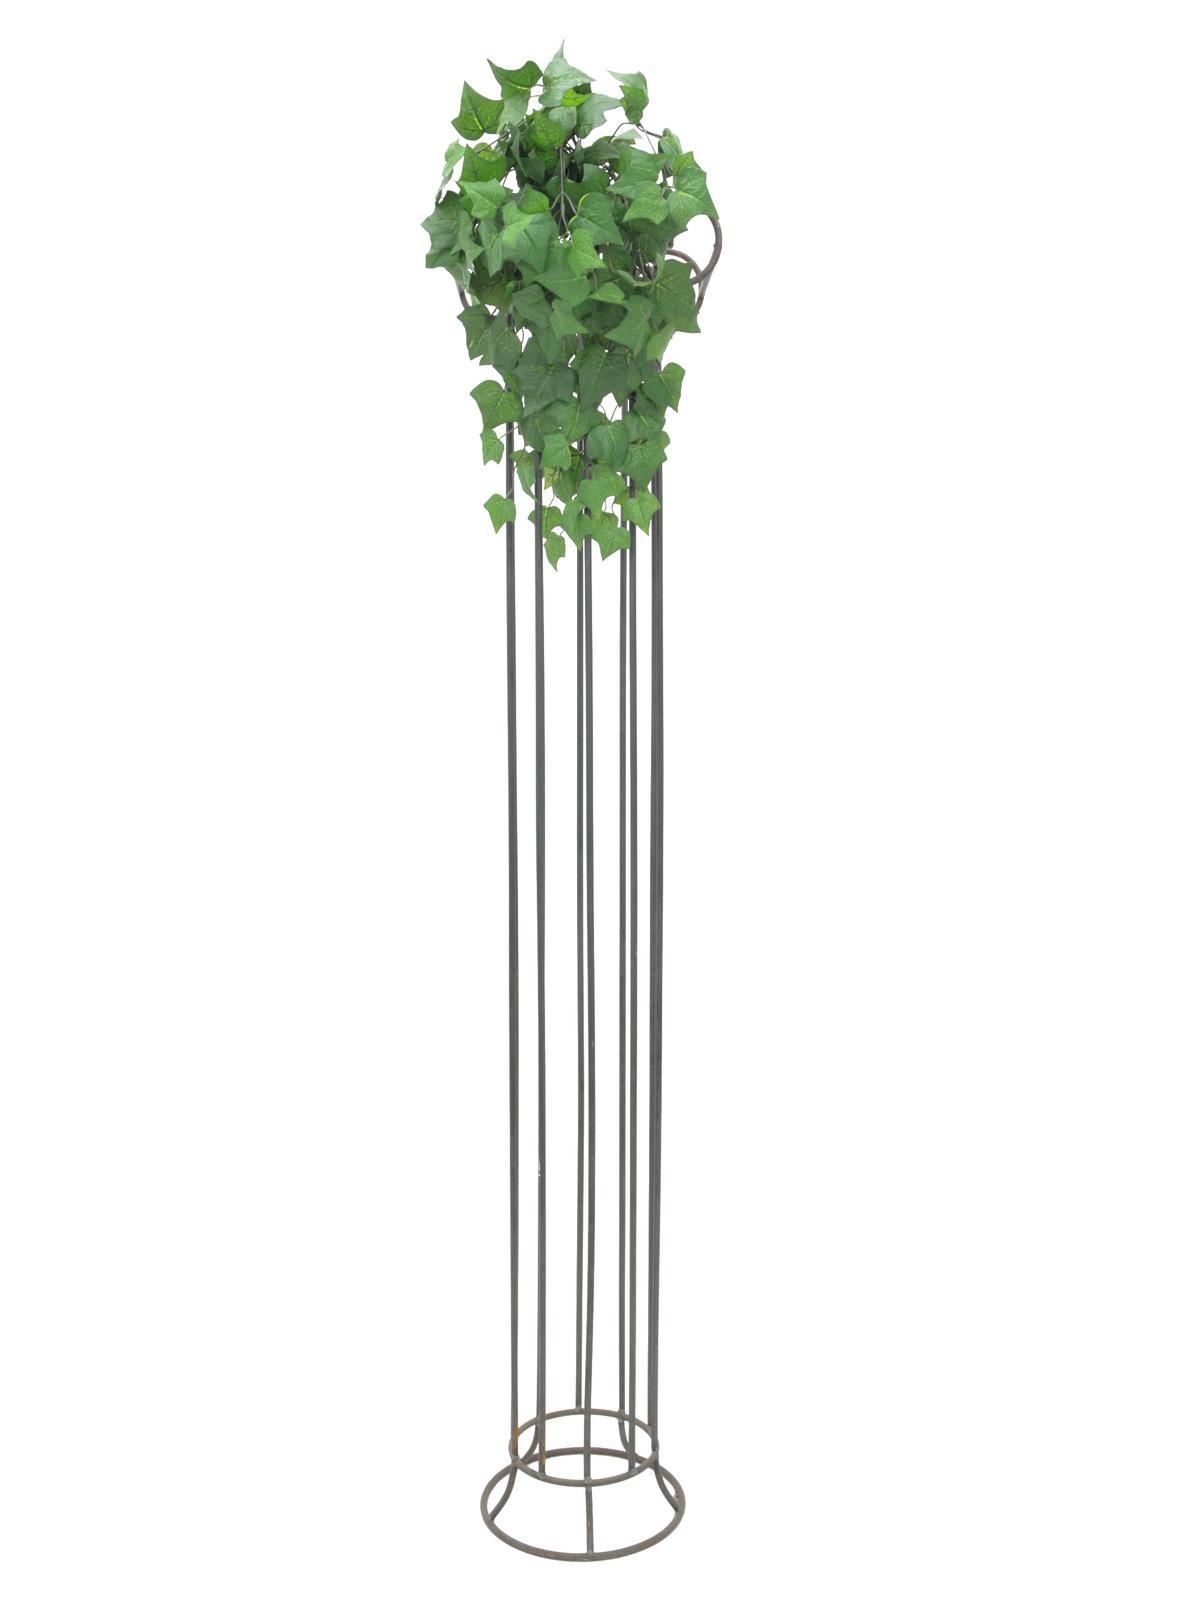 EUROPALMS Ivy bush, 60cm